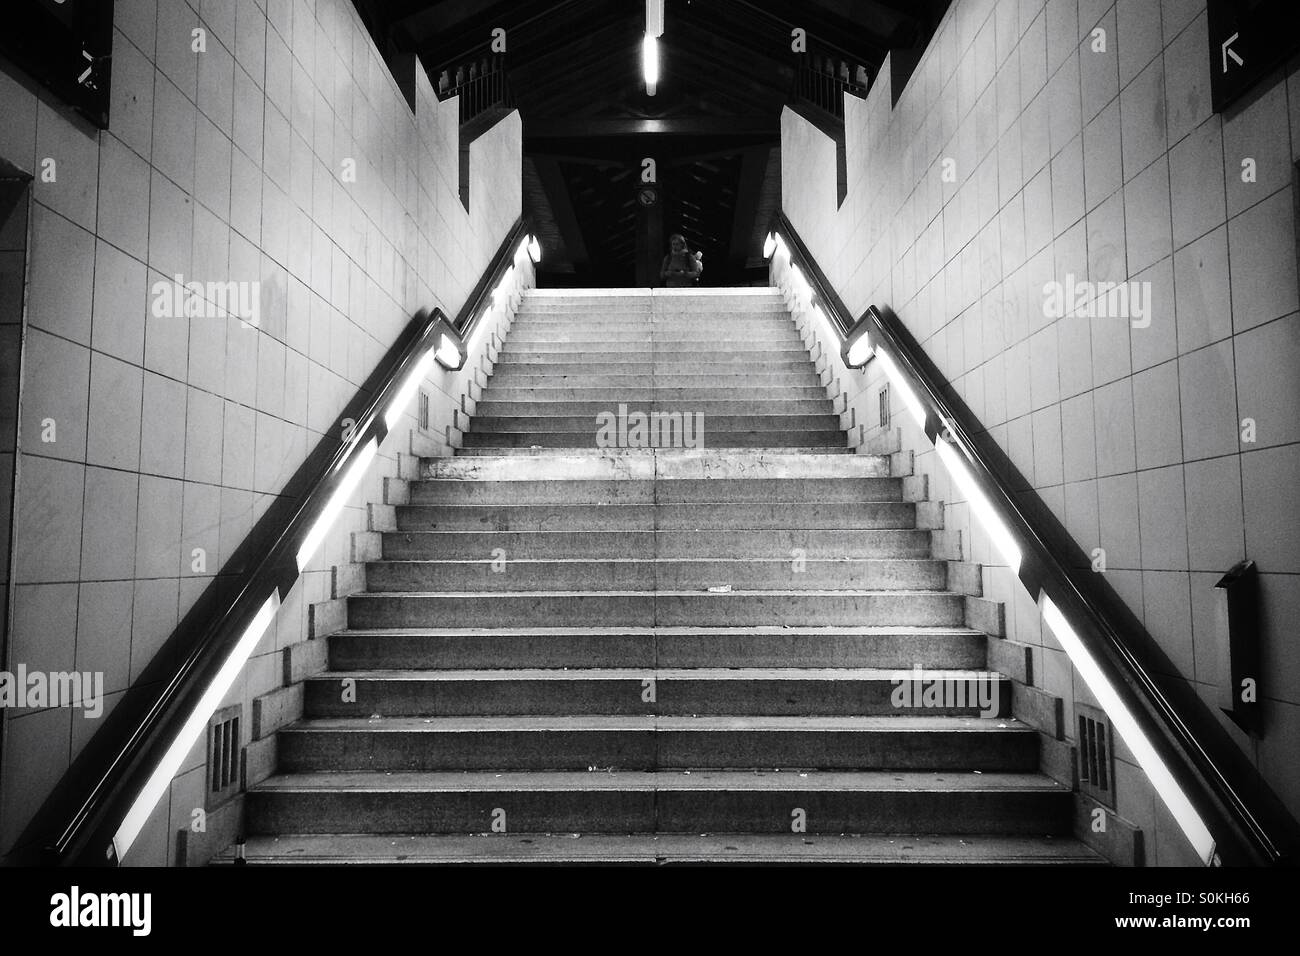 Treppen Stock Photos & Treppen Stock Images - Alamy